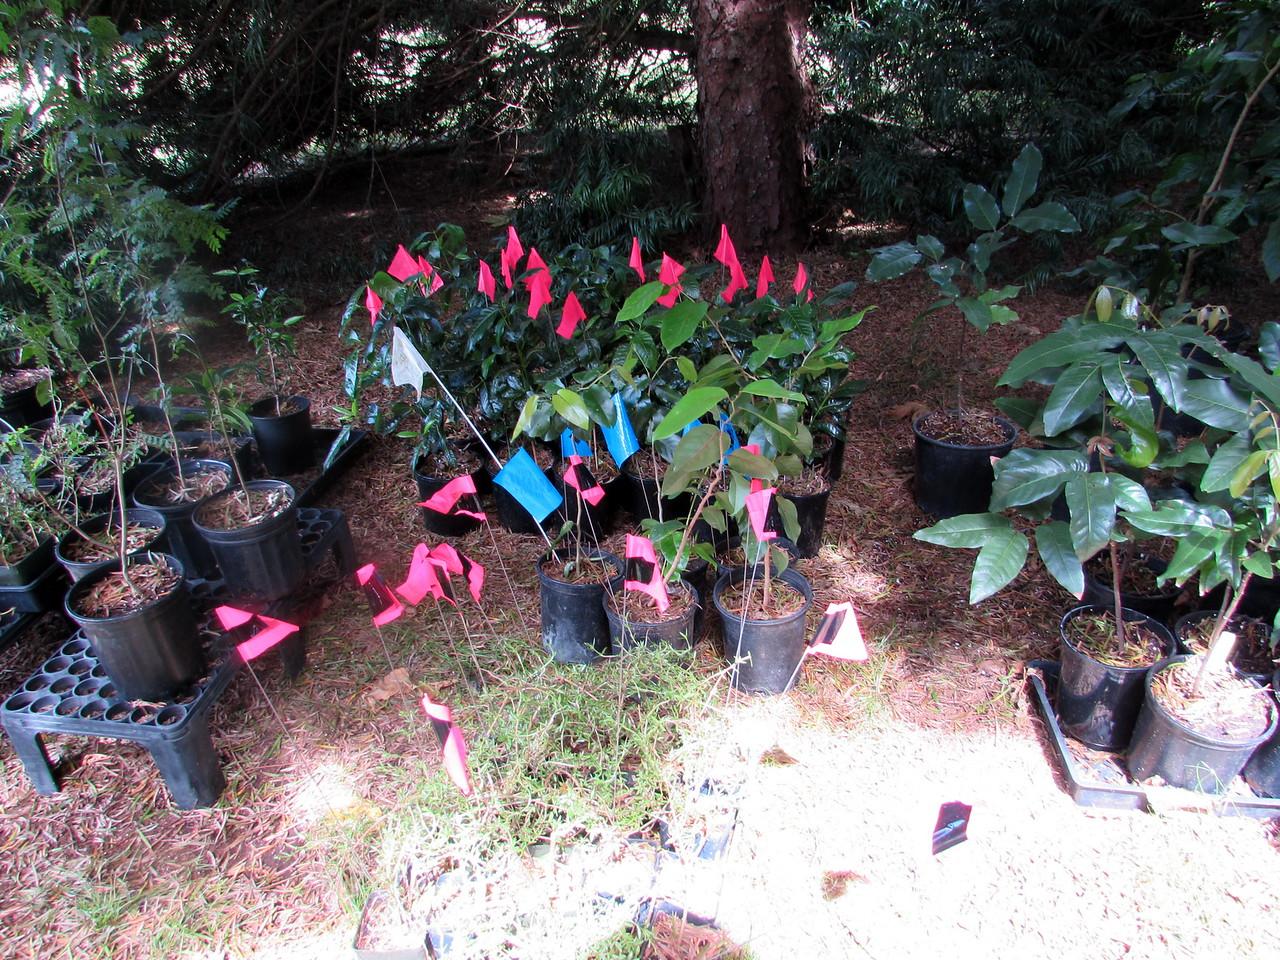 Today's plants are marked with flags. Pink & black: Kūkaenēnē (Coprosma ernodeoides). Blue: Maua (Xylosma hawaiiense),  pink: Nā'ū or Nānū (Gardenia brighamii) (Photo by Irene Newhouse)